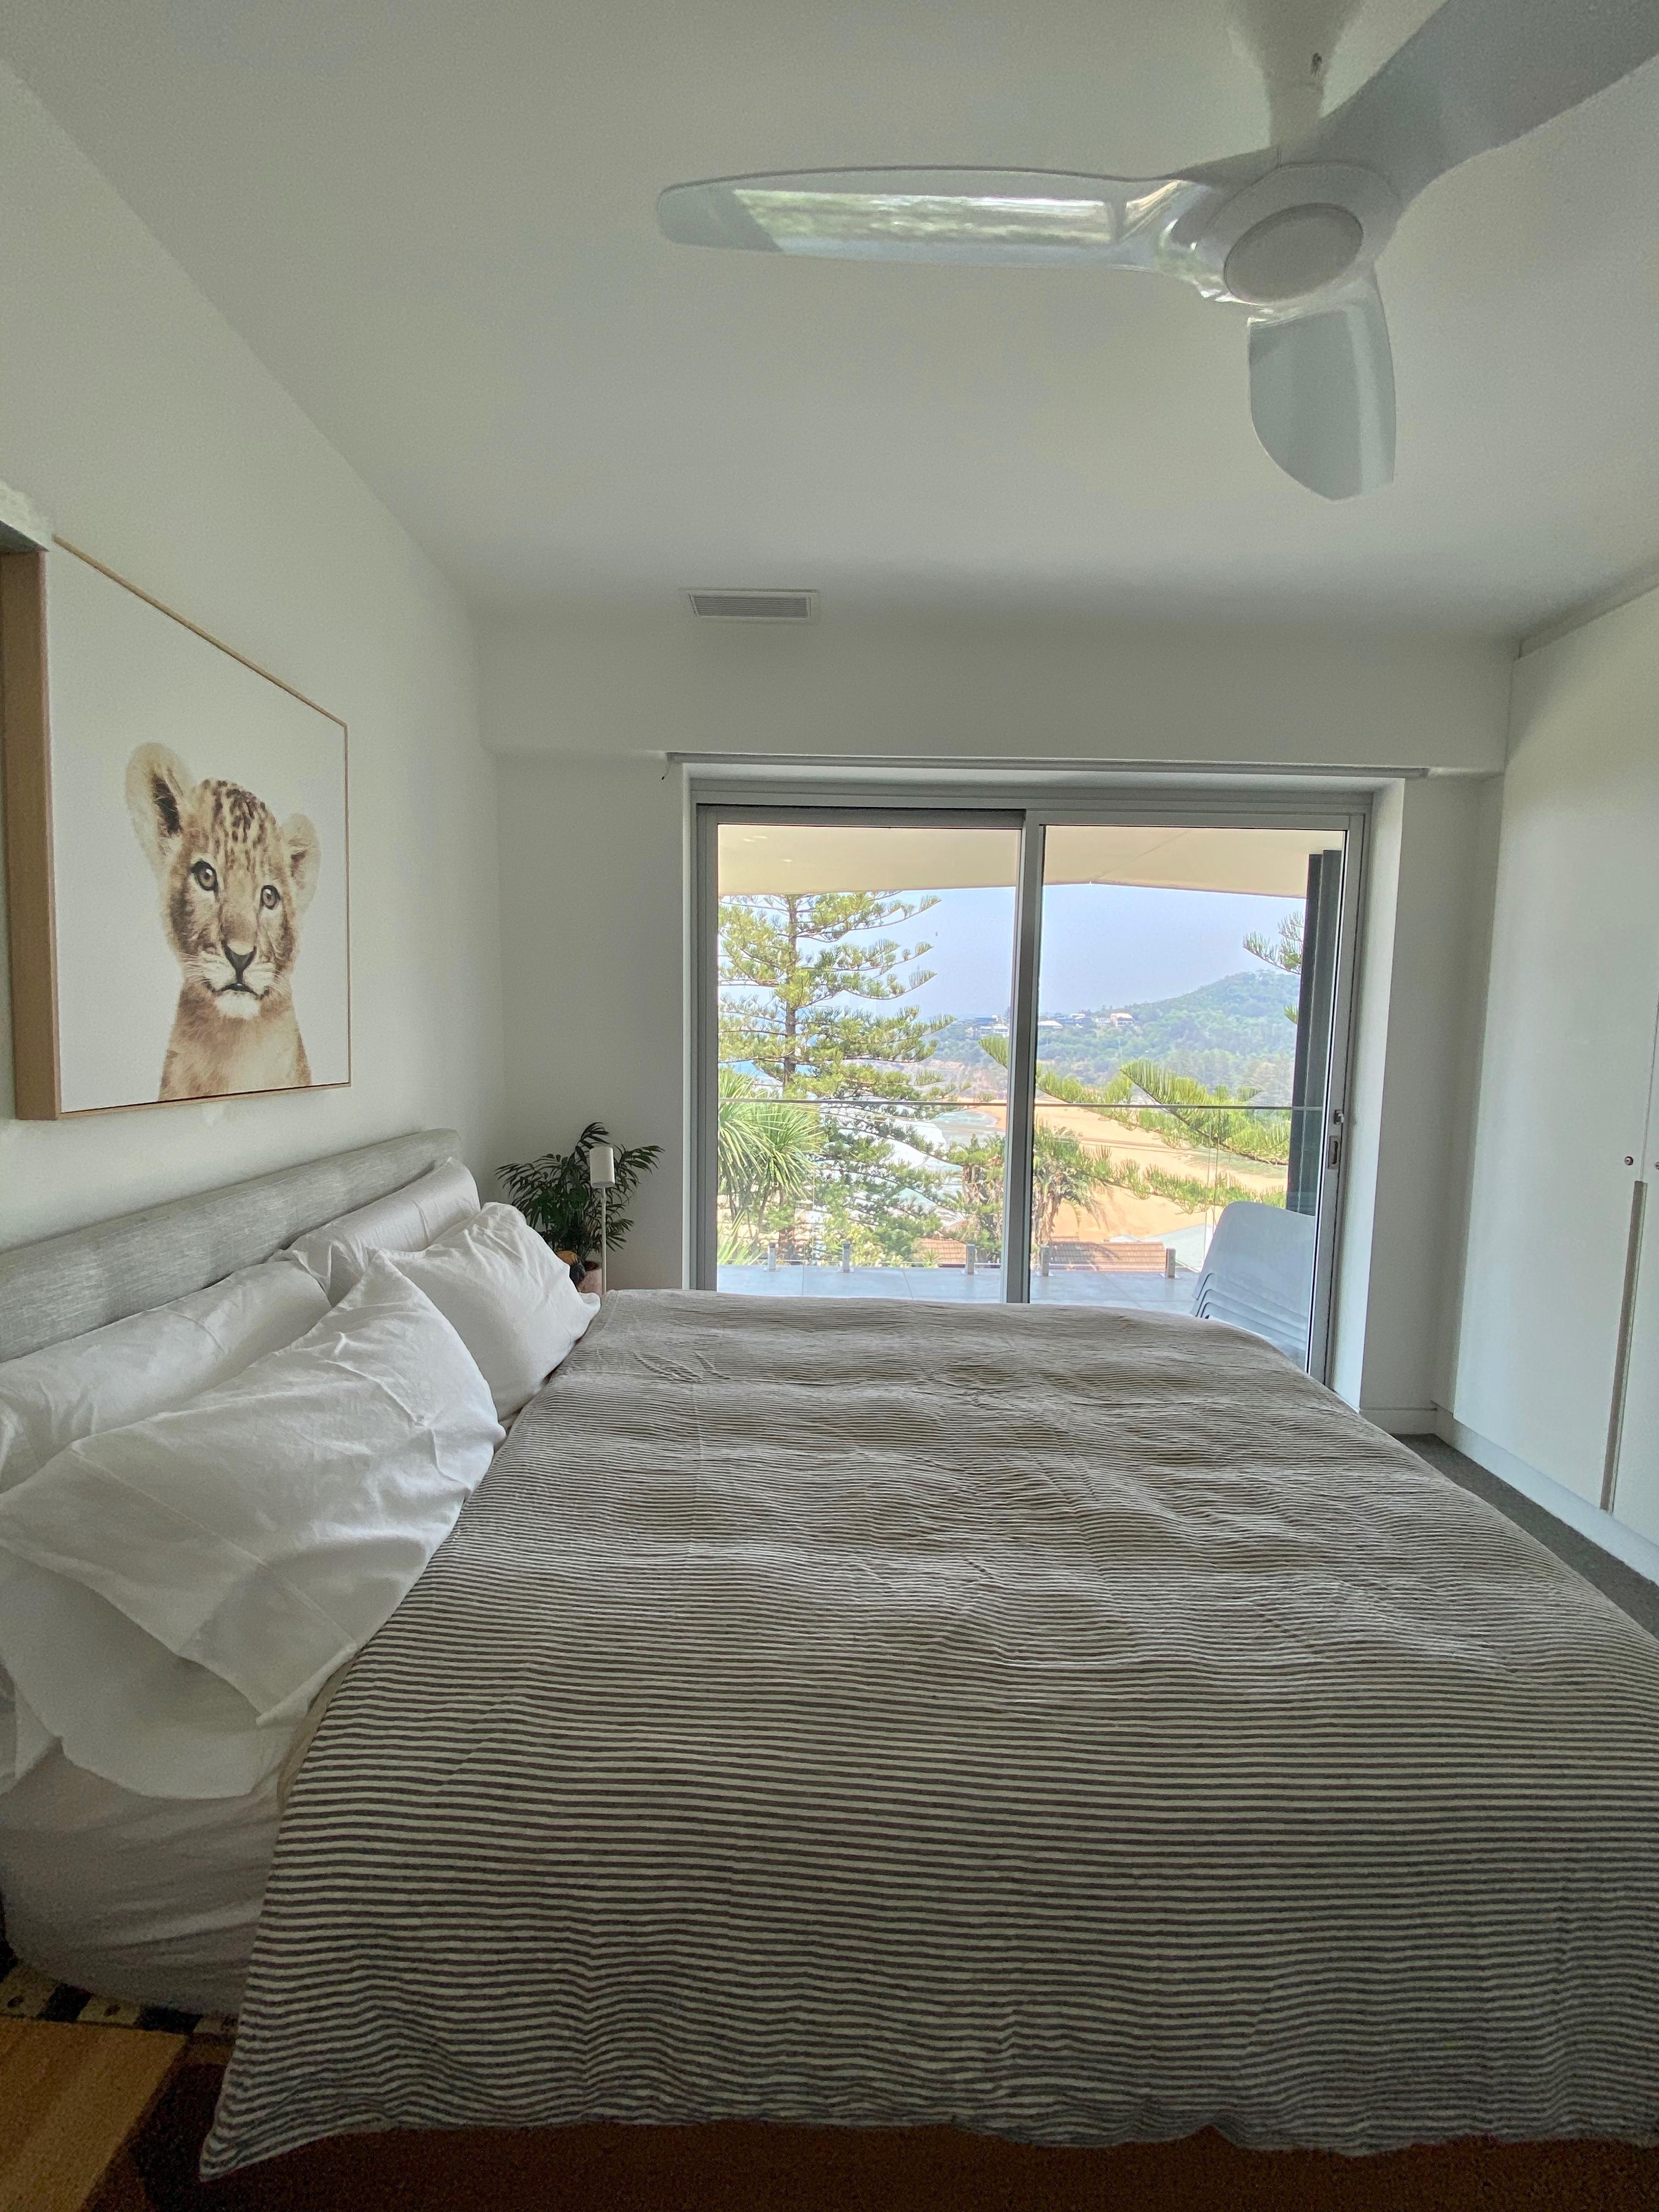 morgans room view